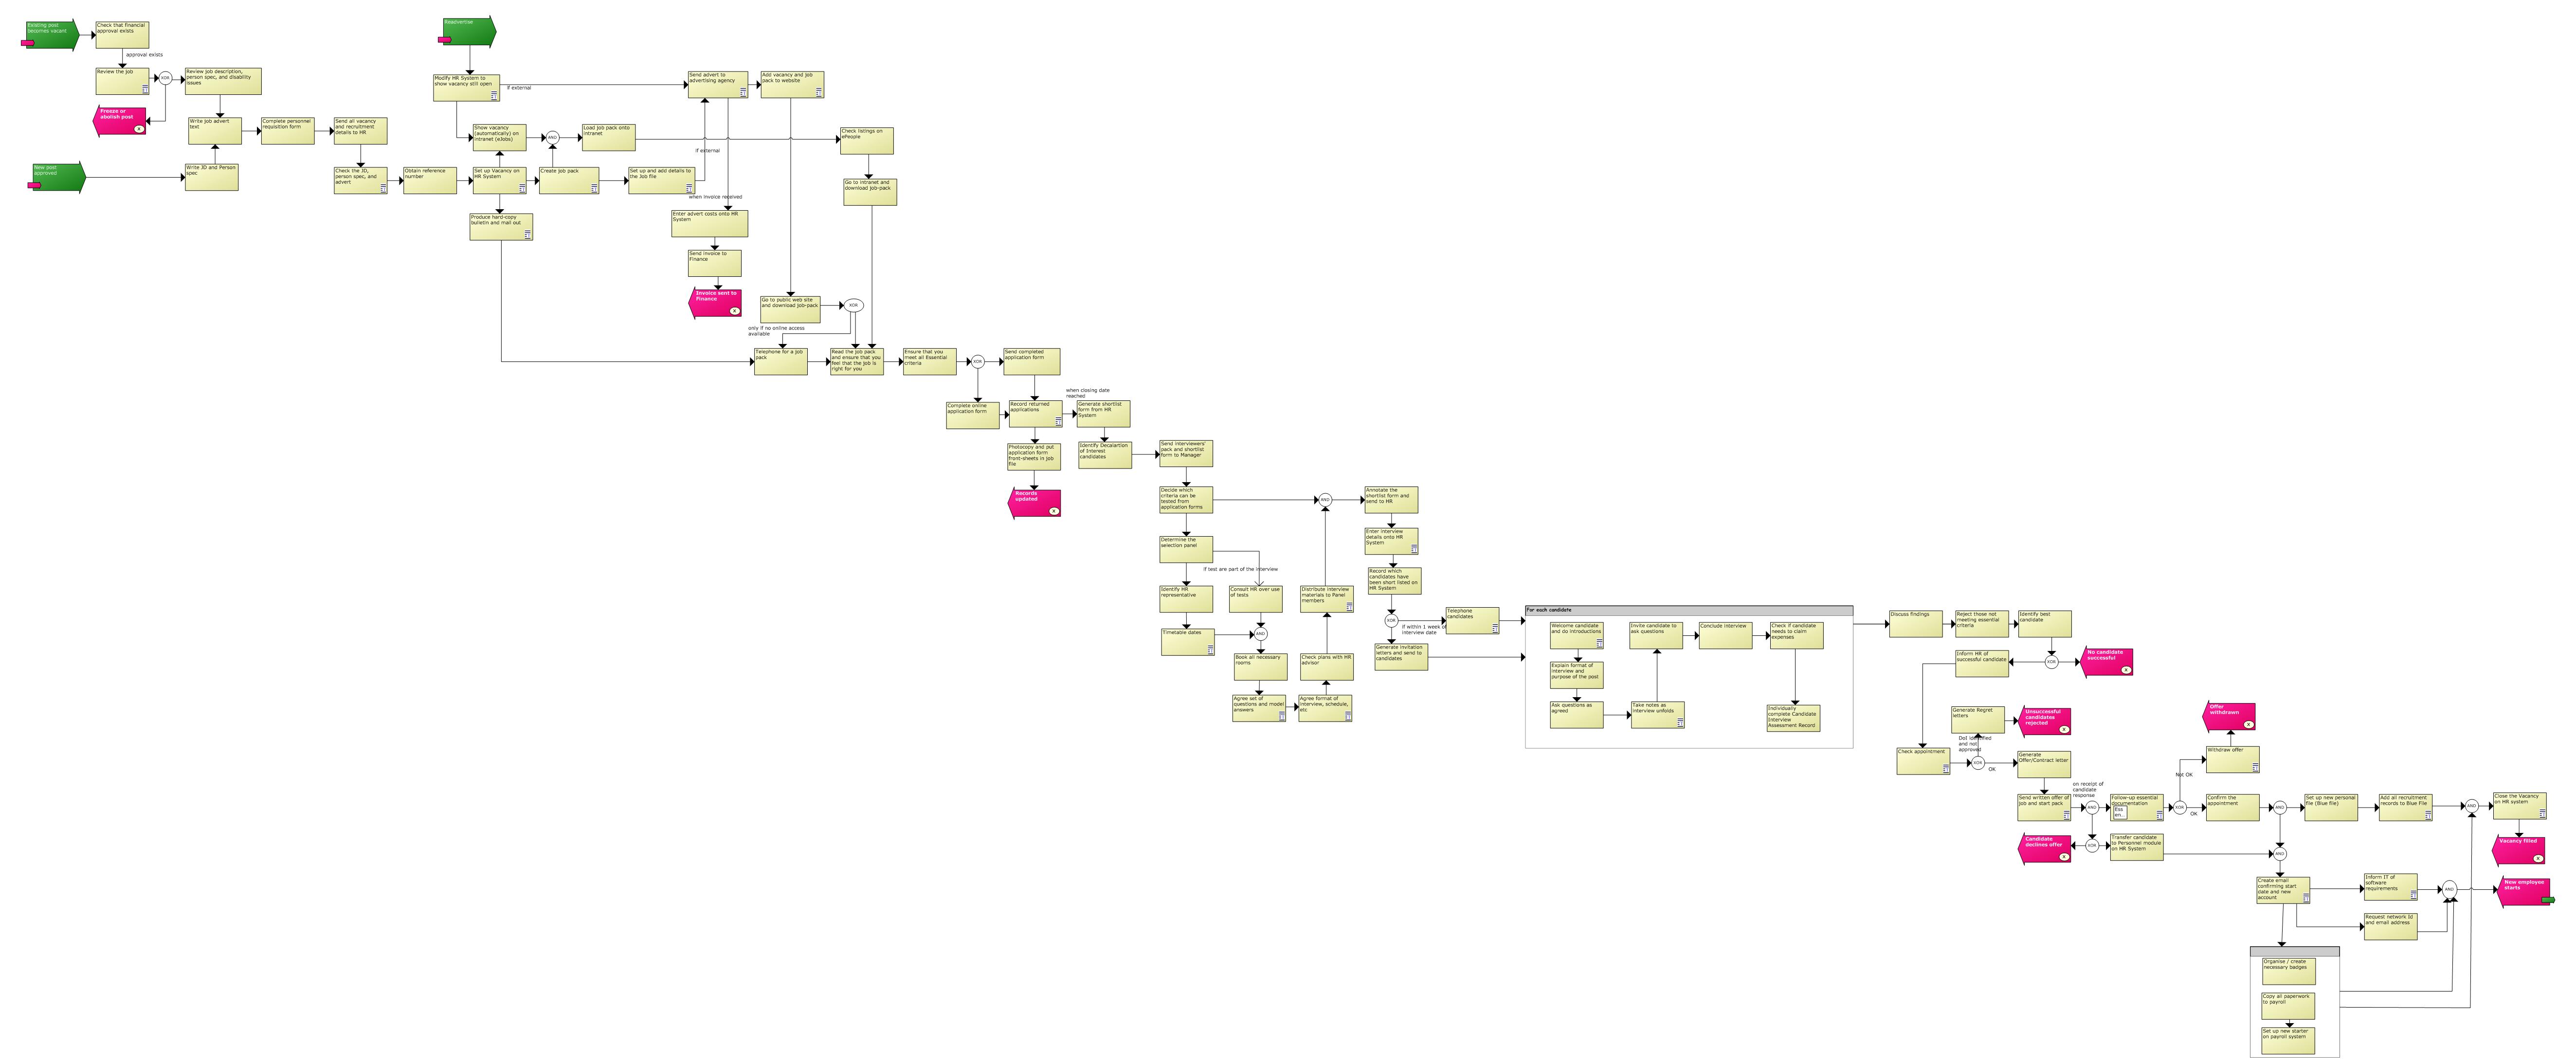 Business Process Flow Diagram Recruitment Large Purpose Of